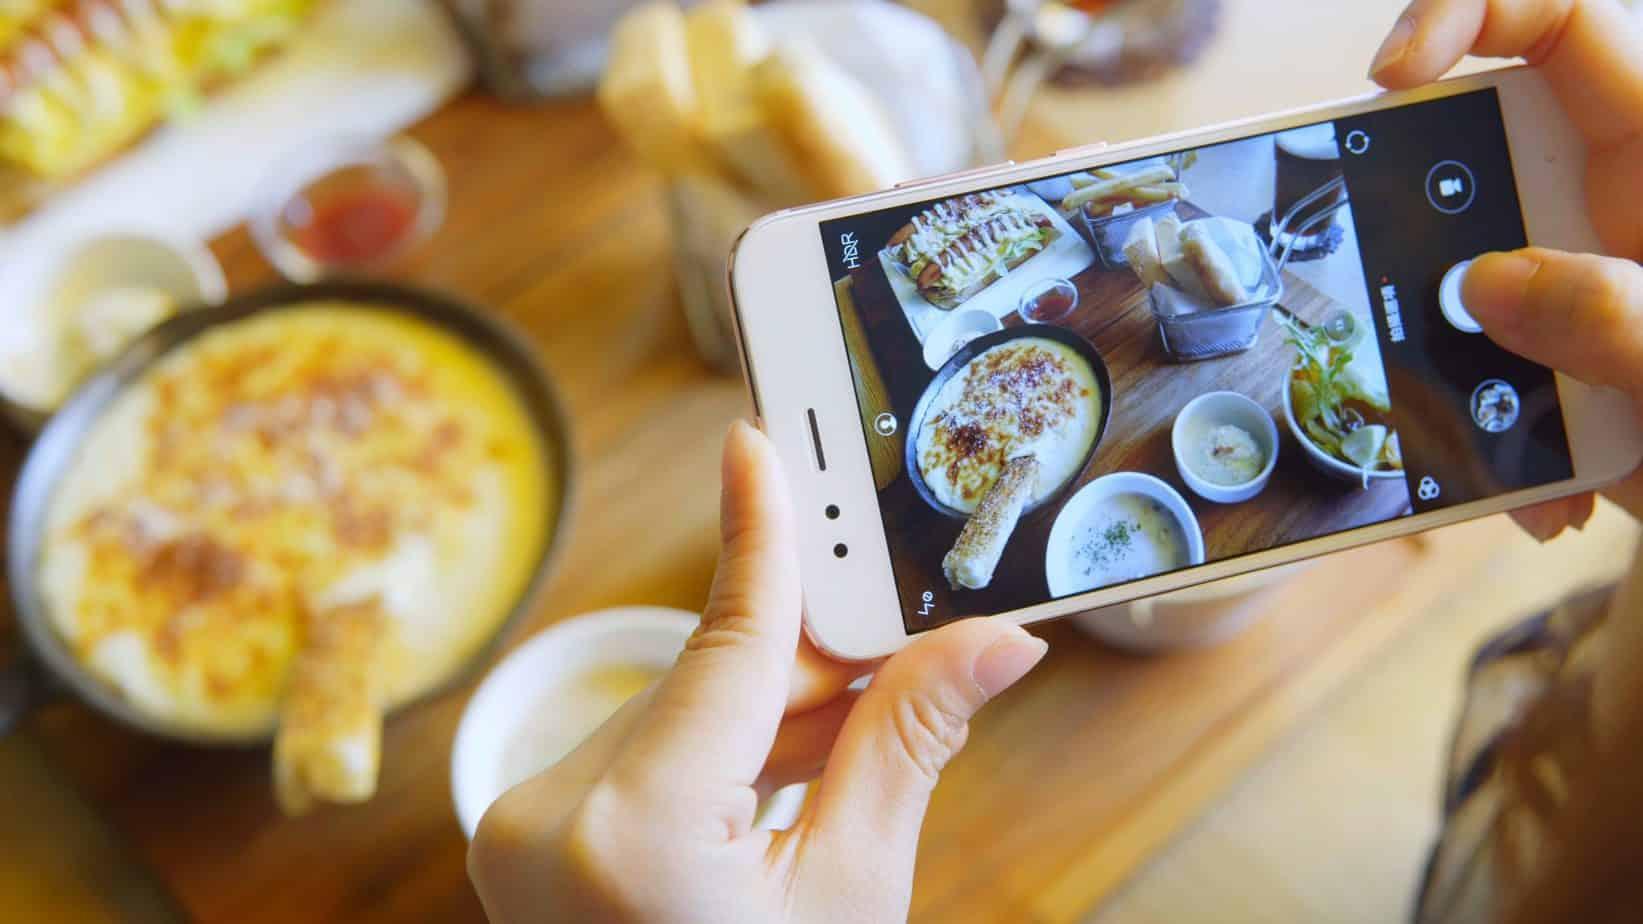 closeup hand holding phone shooting food photograph